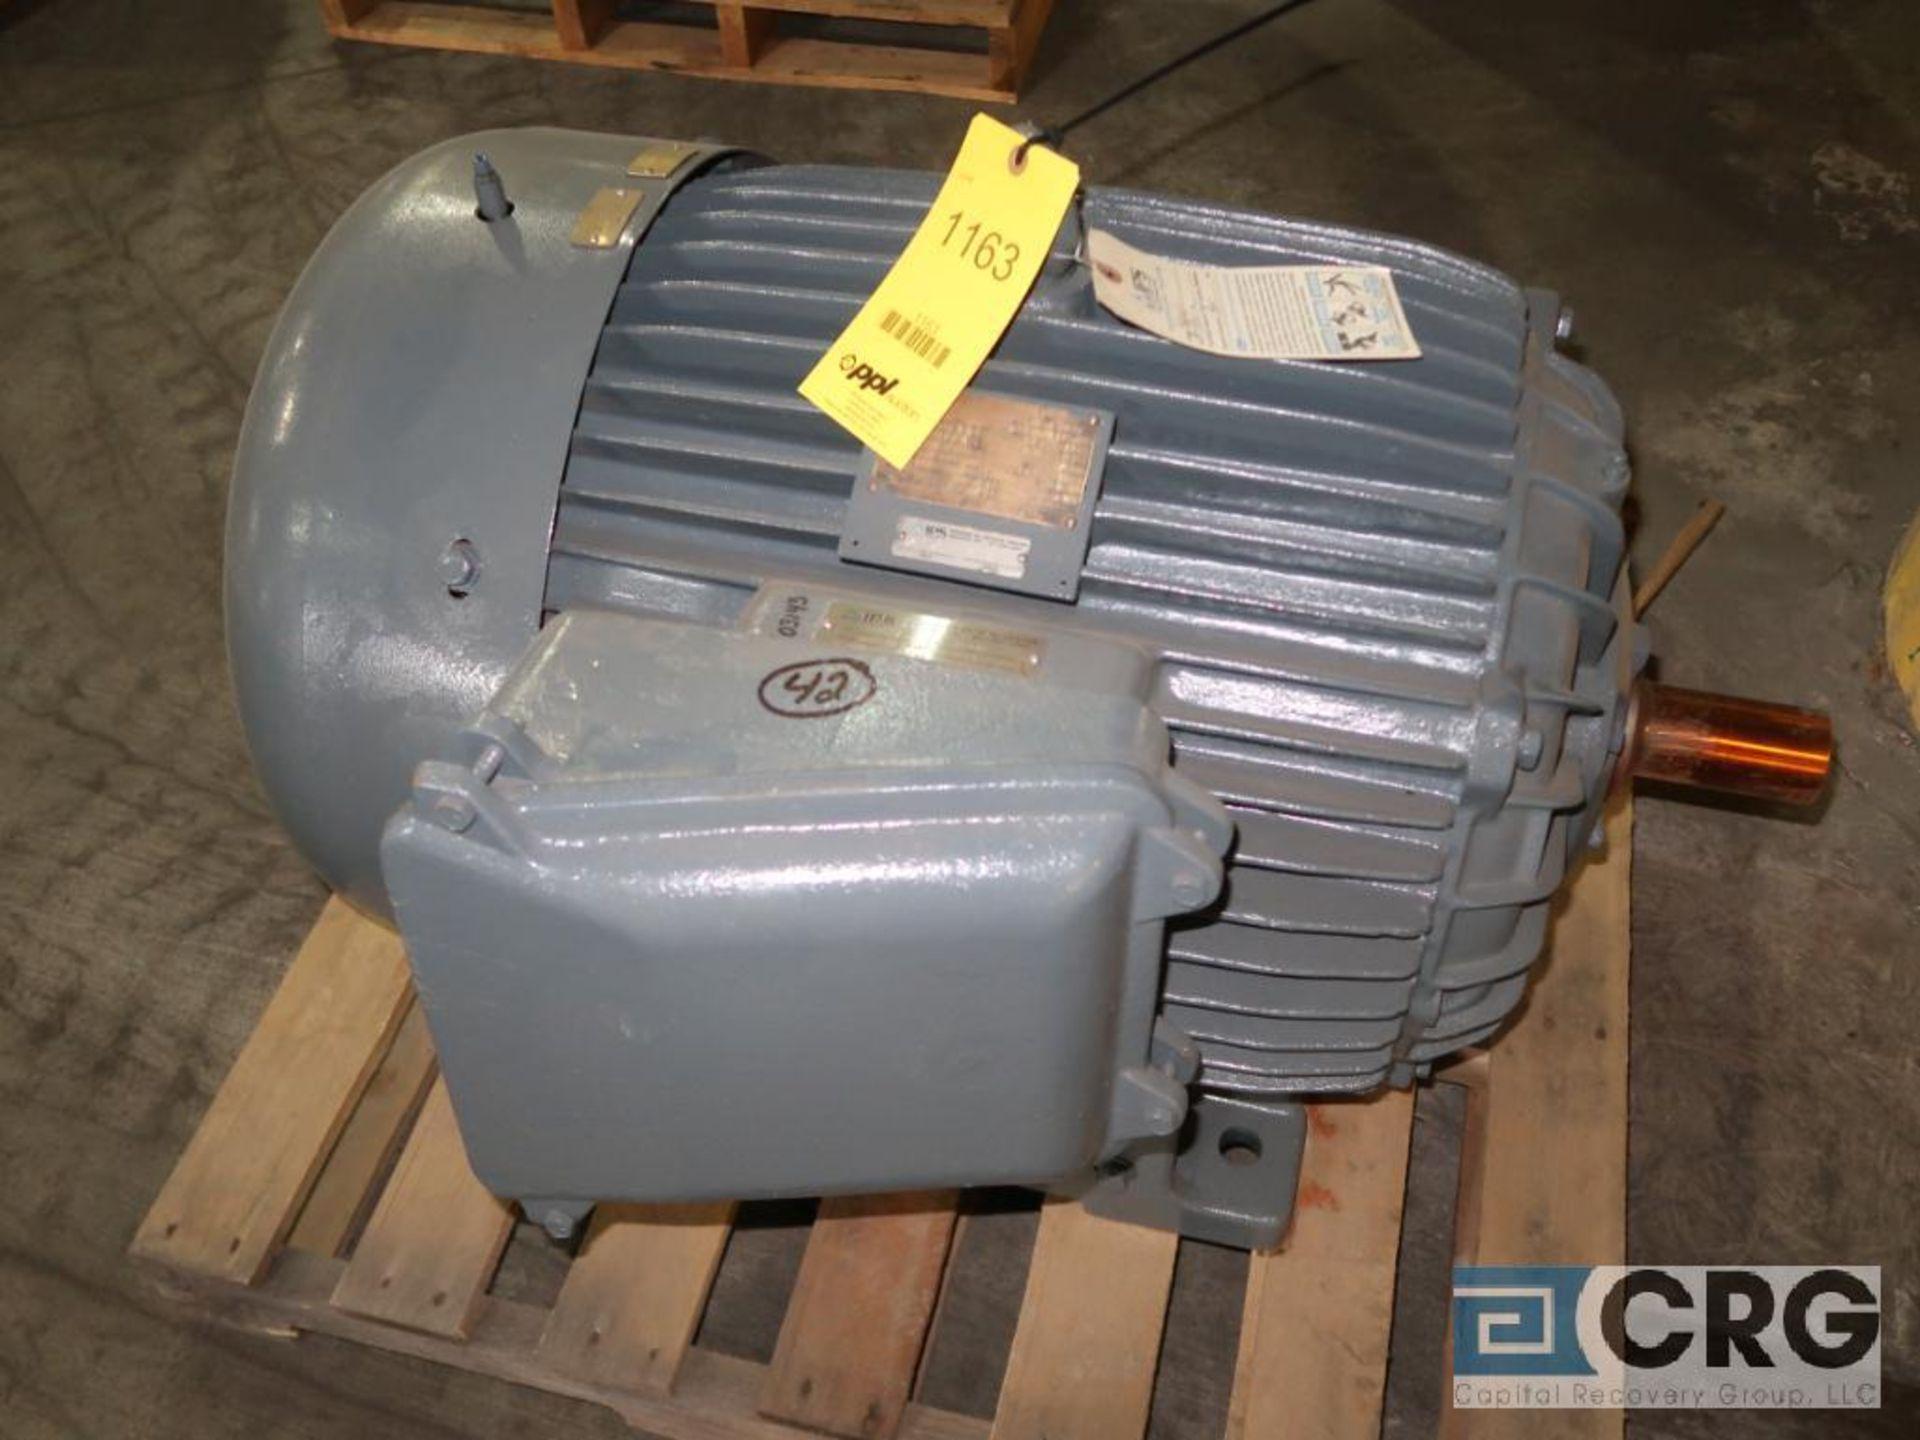 Elektrim motor, 100 HP, 1,775 RPMs, 230/460 volt, 3 ph., 405TS frame (Finish Building)